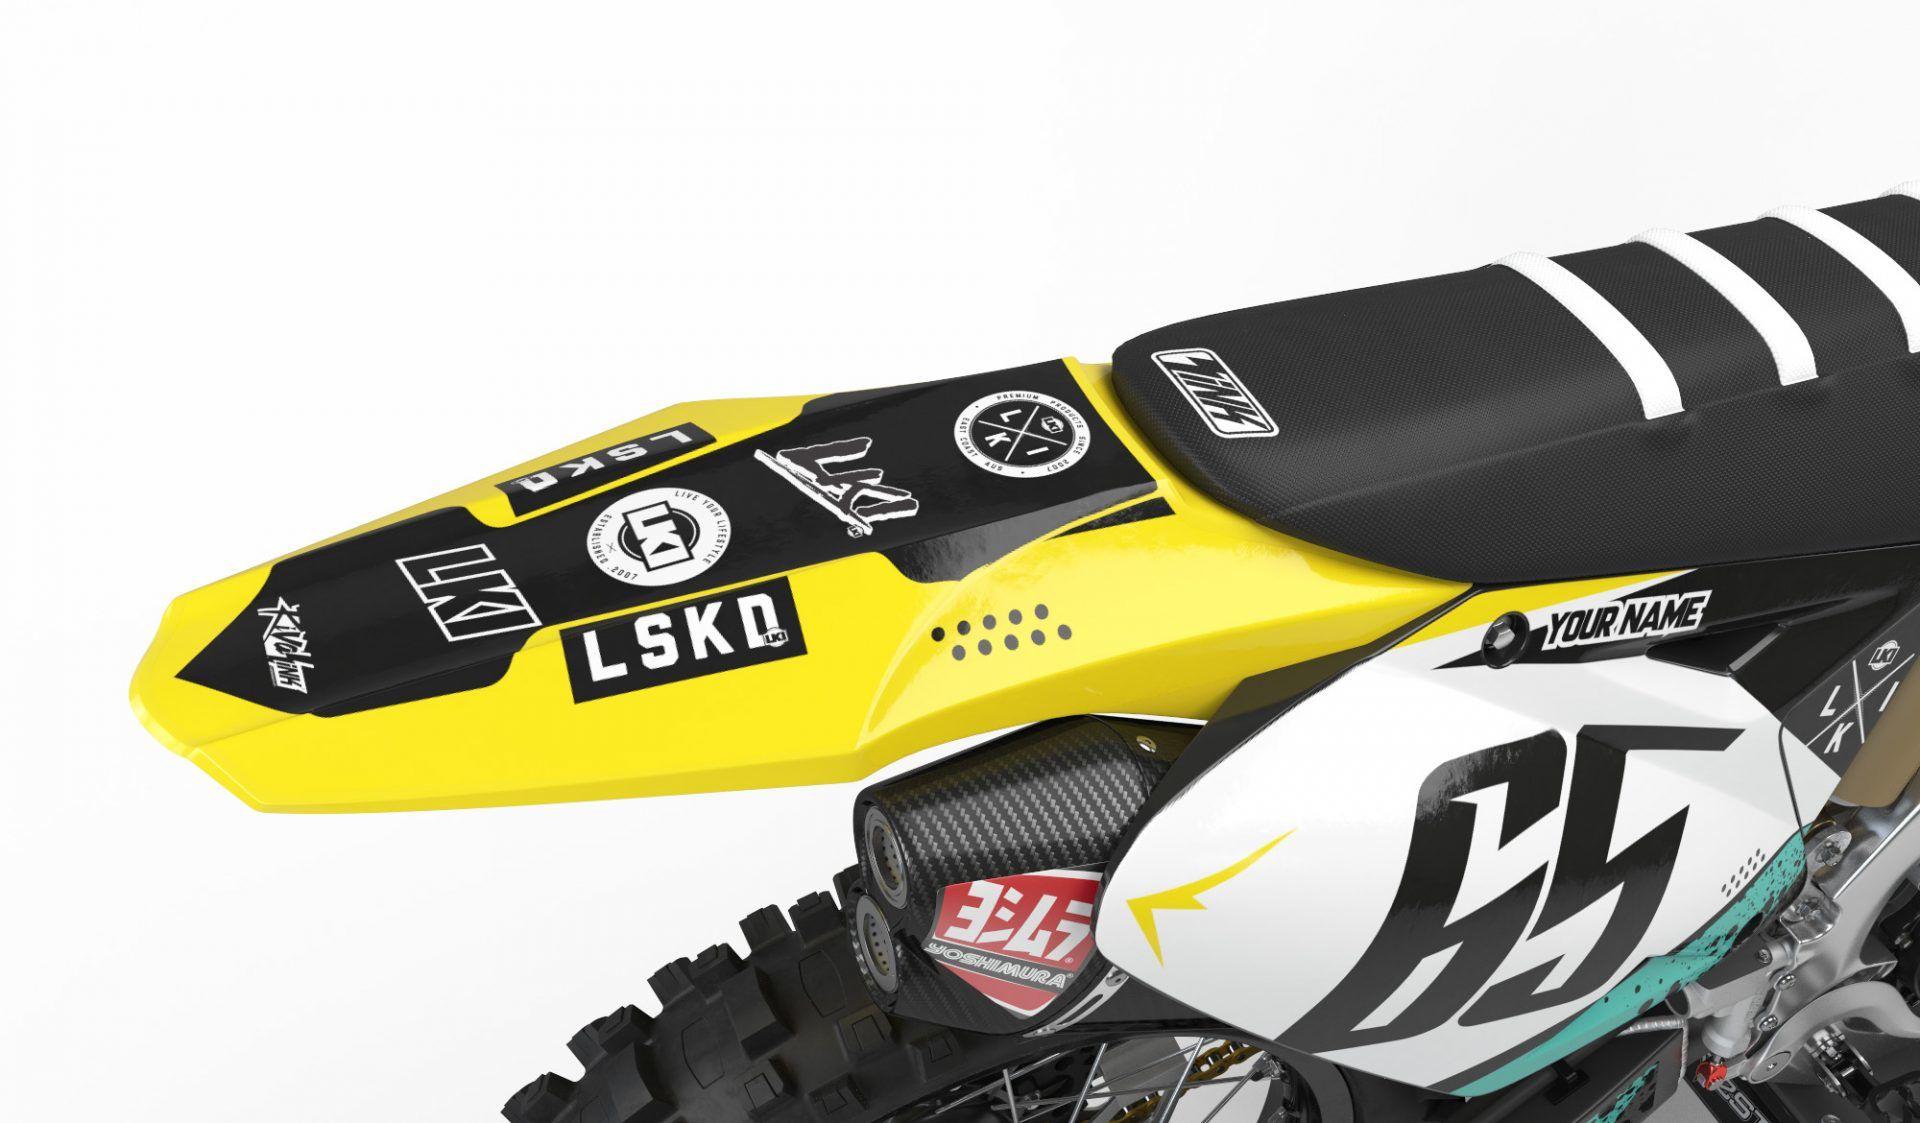 Neon yellow kit rival ink design co custom motocross graphics - Lki Suzuki Lskd17 Kit 133 97 200 97 Official Loosekid Industries Range Of Custom Graphics